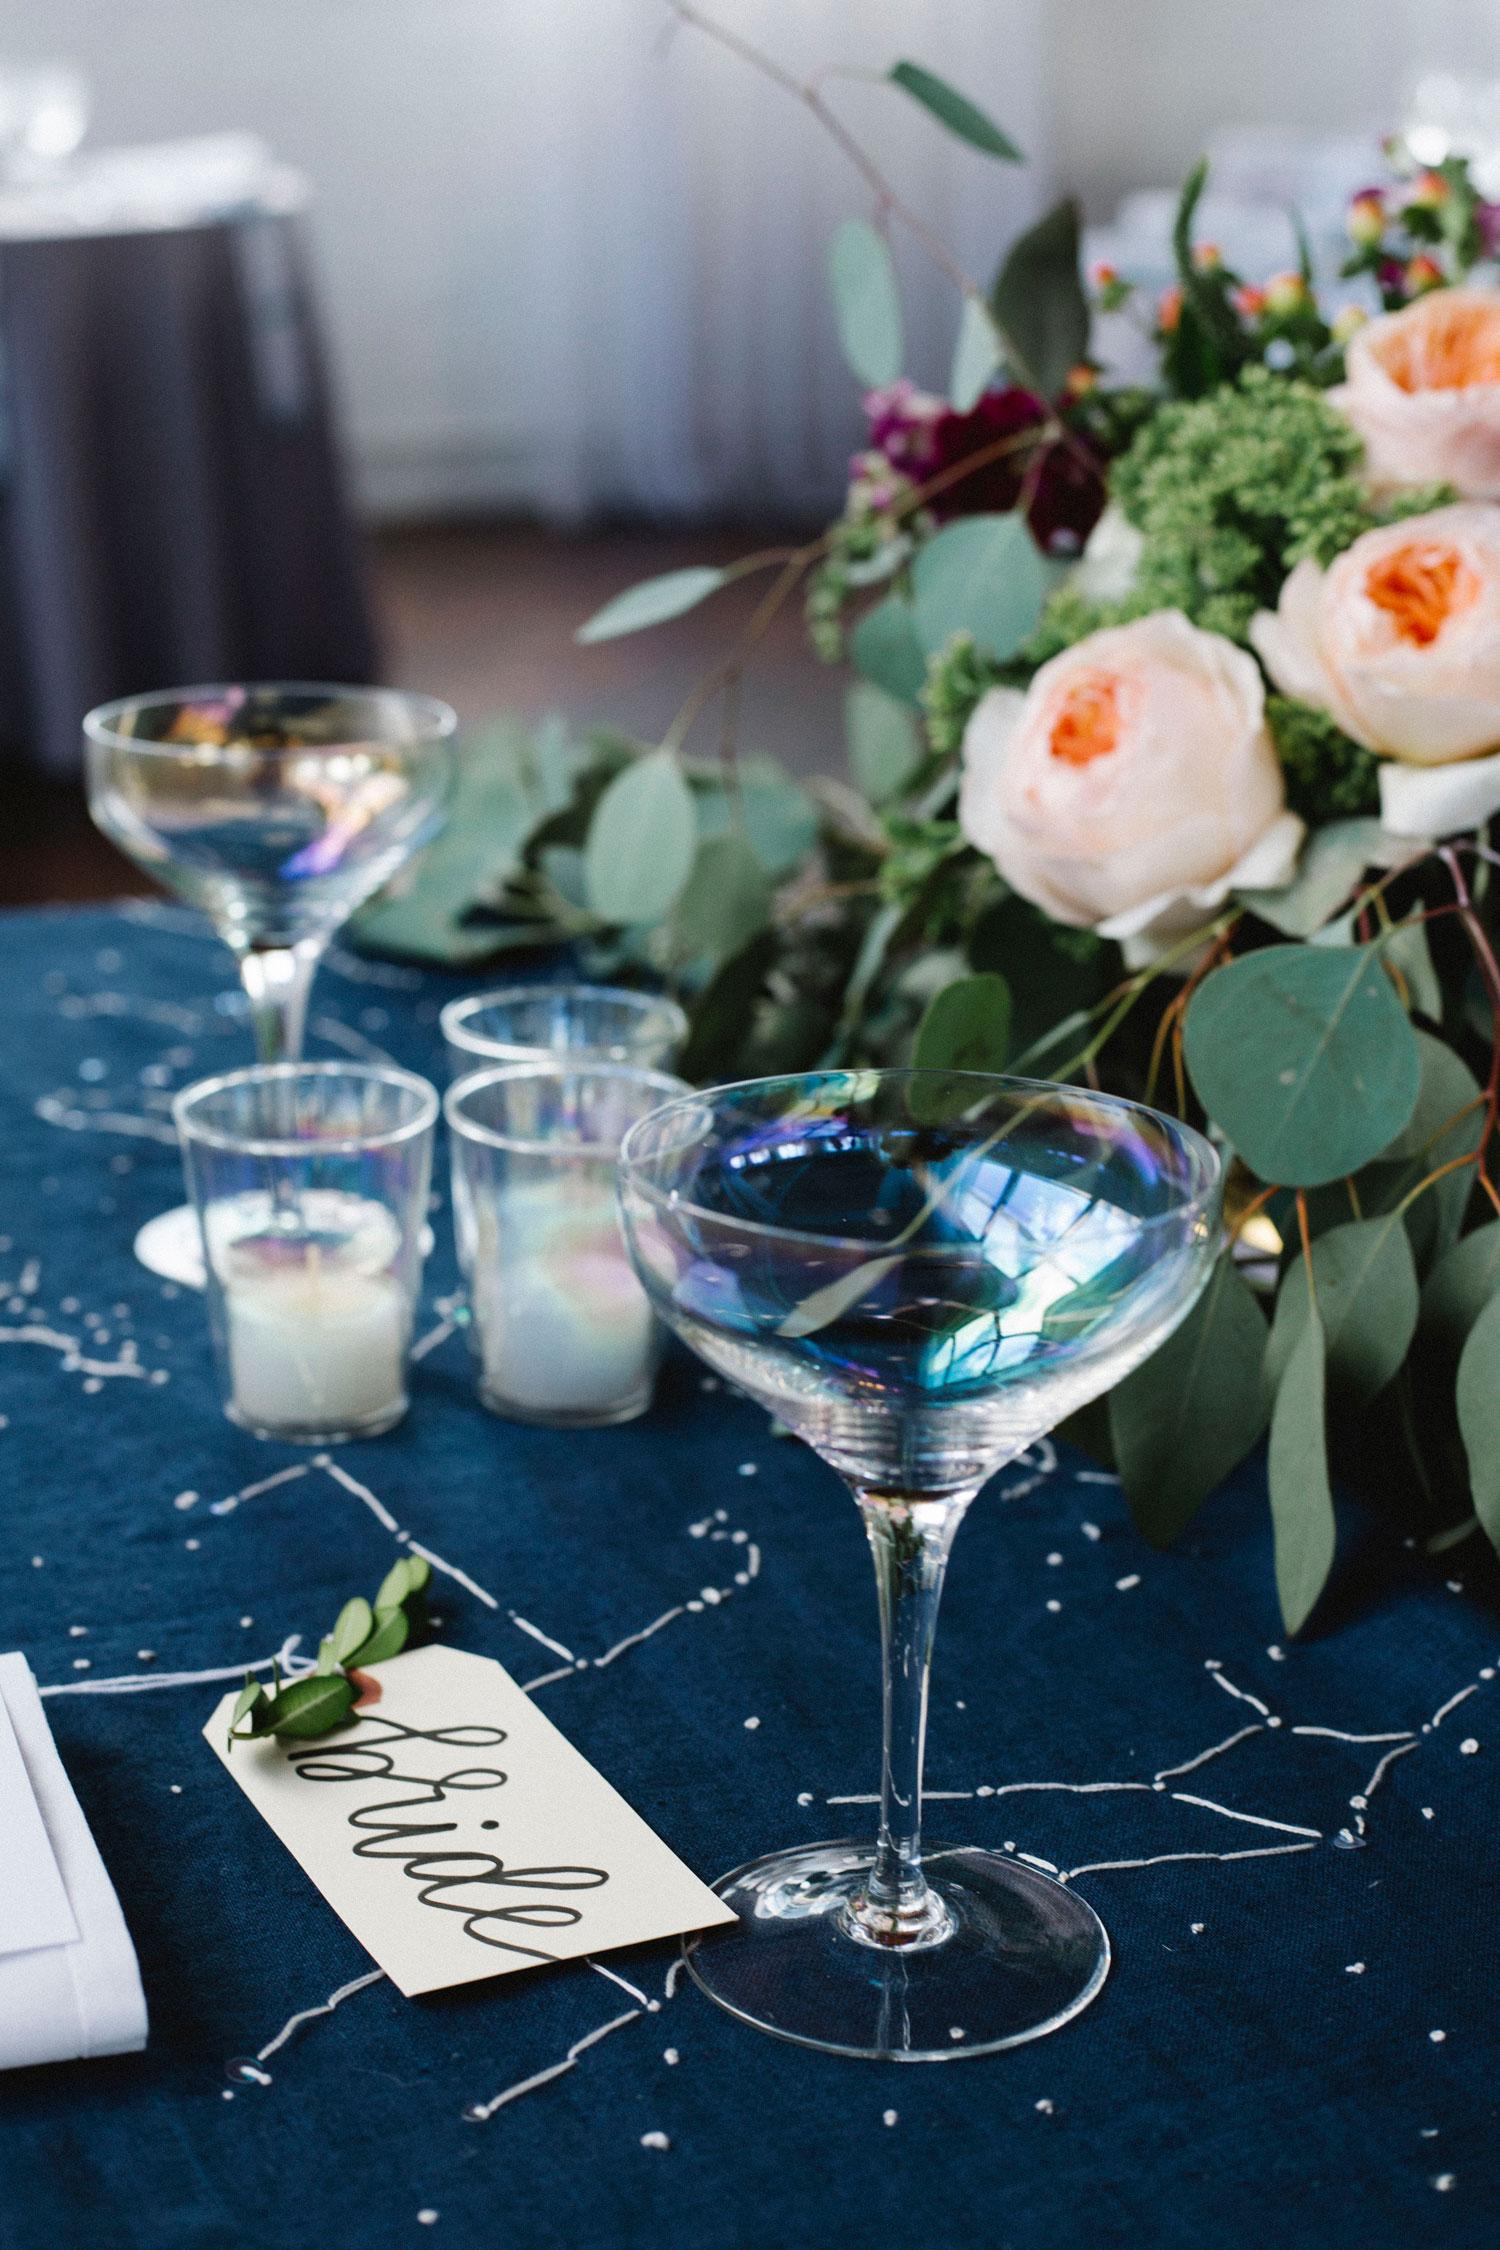 RachaelGibilterra_WeddingStationery_12.jpg